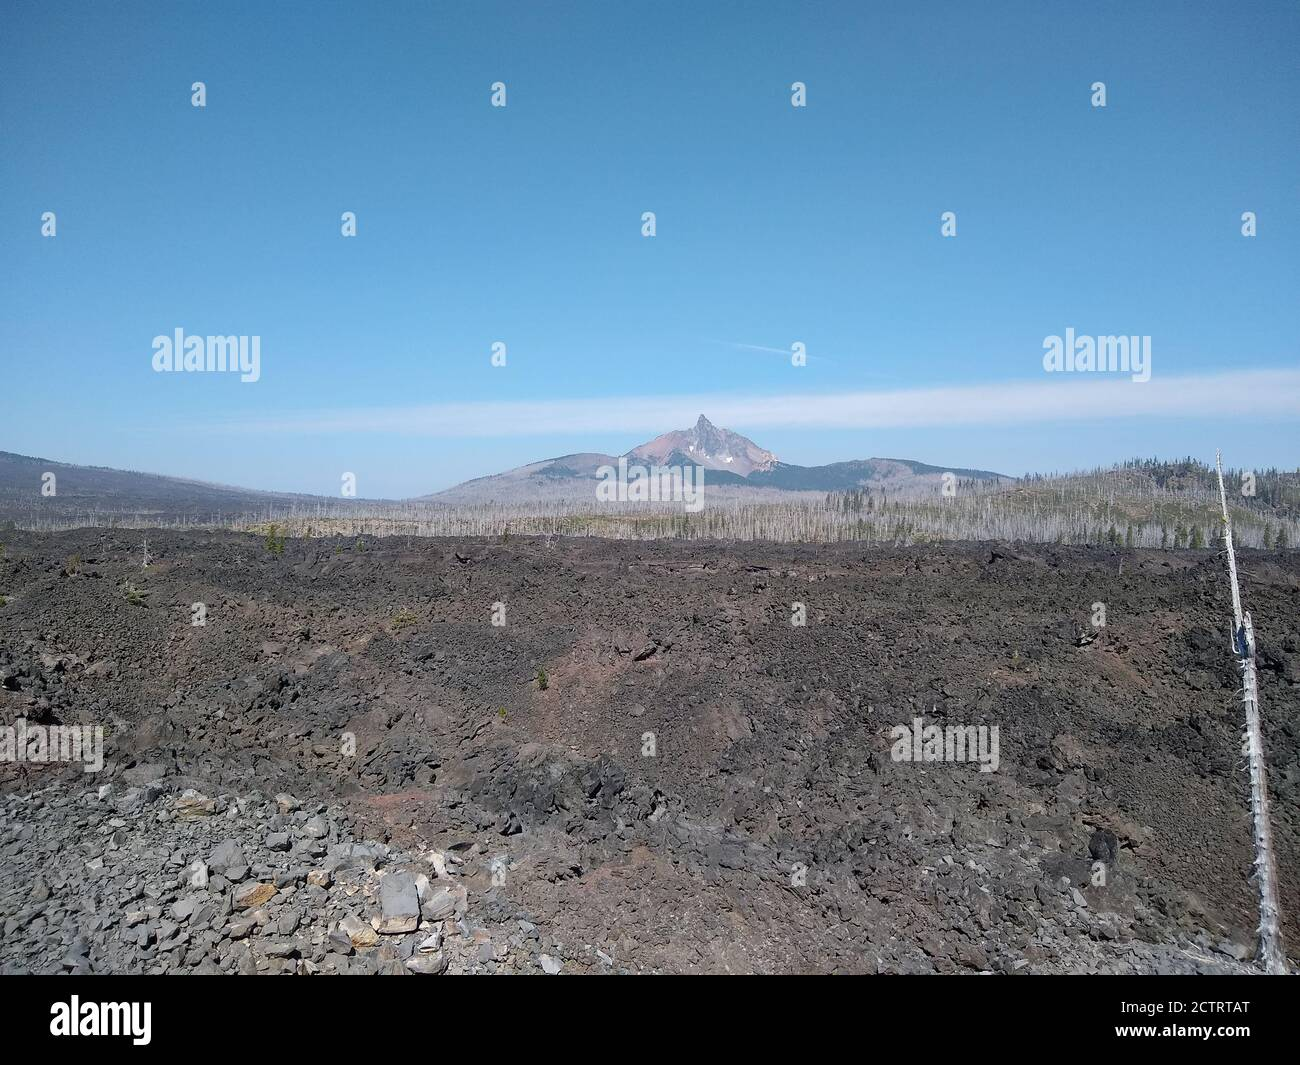 Lava fields in Willamette National Forest seen from Dee Wright Observatory near Sisters, Oregon. Stock Photo